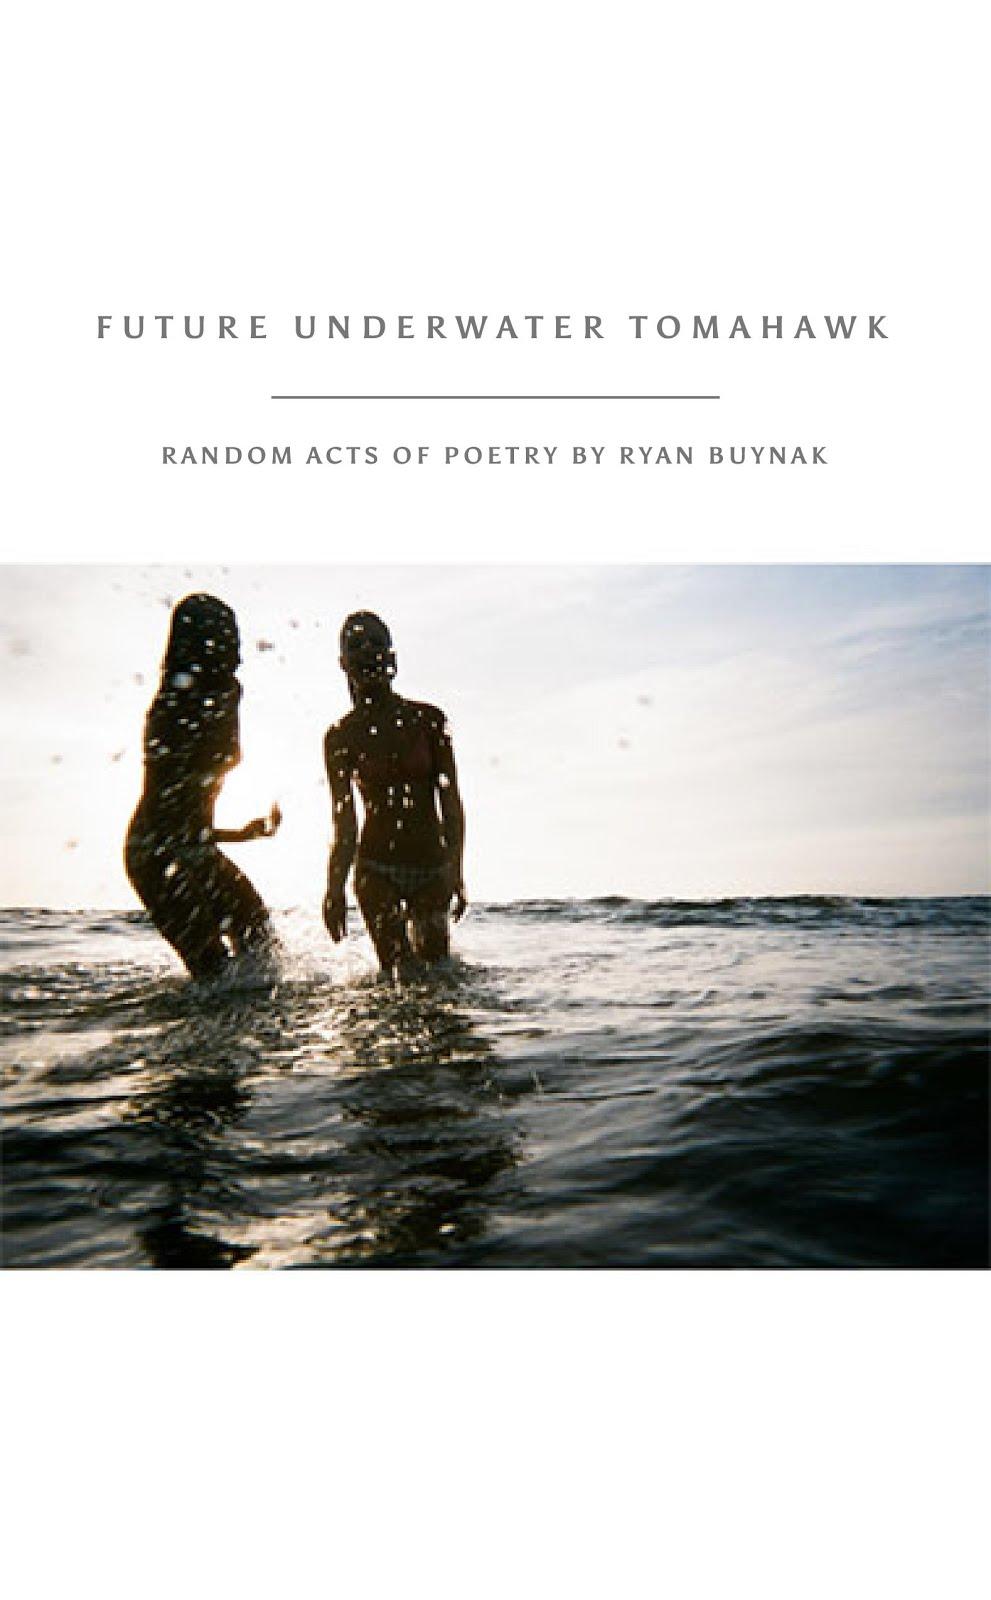 Future Underwater Tomahawk